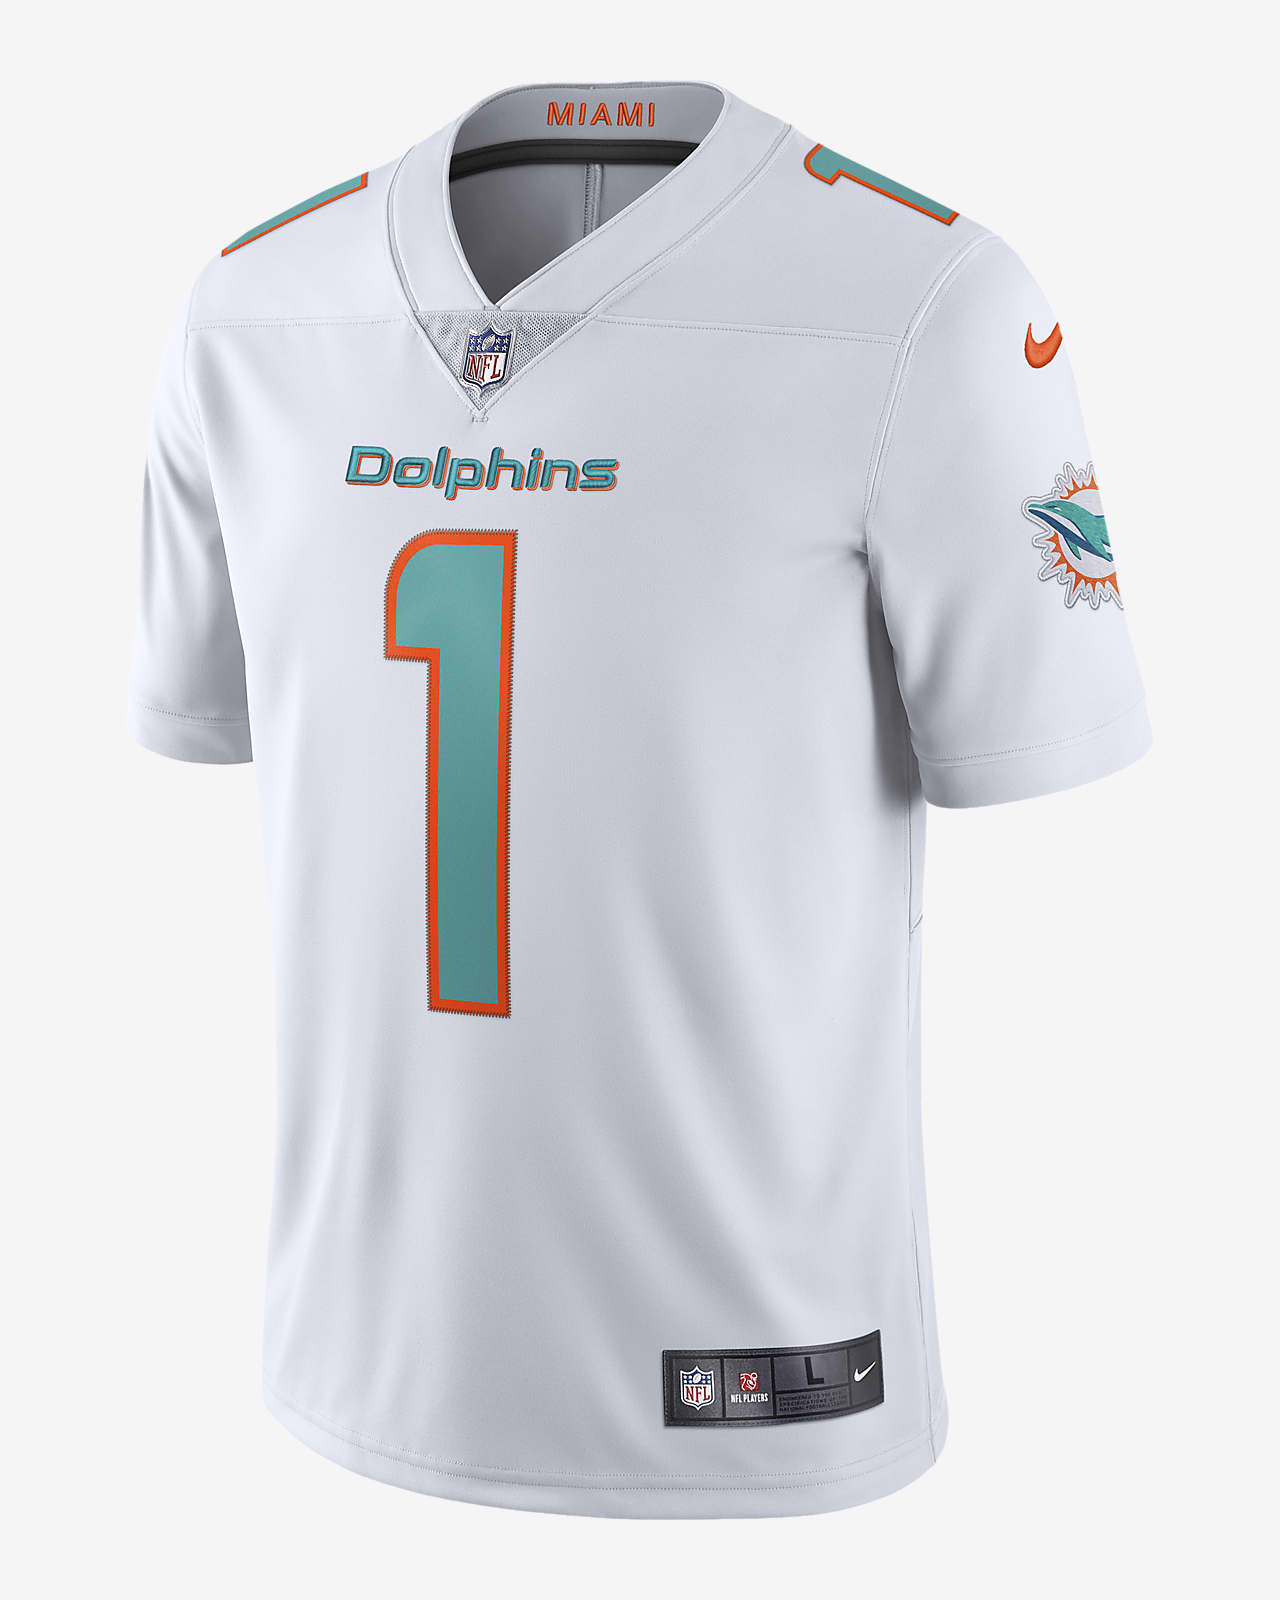 NFL Miami Dolphins (Tua Tagovailoa) Men's Game Football Jersey